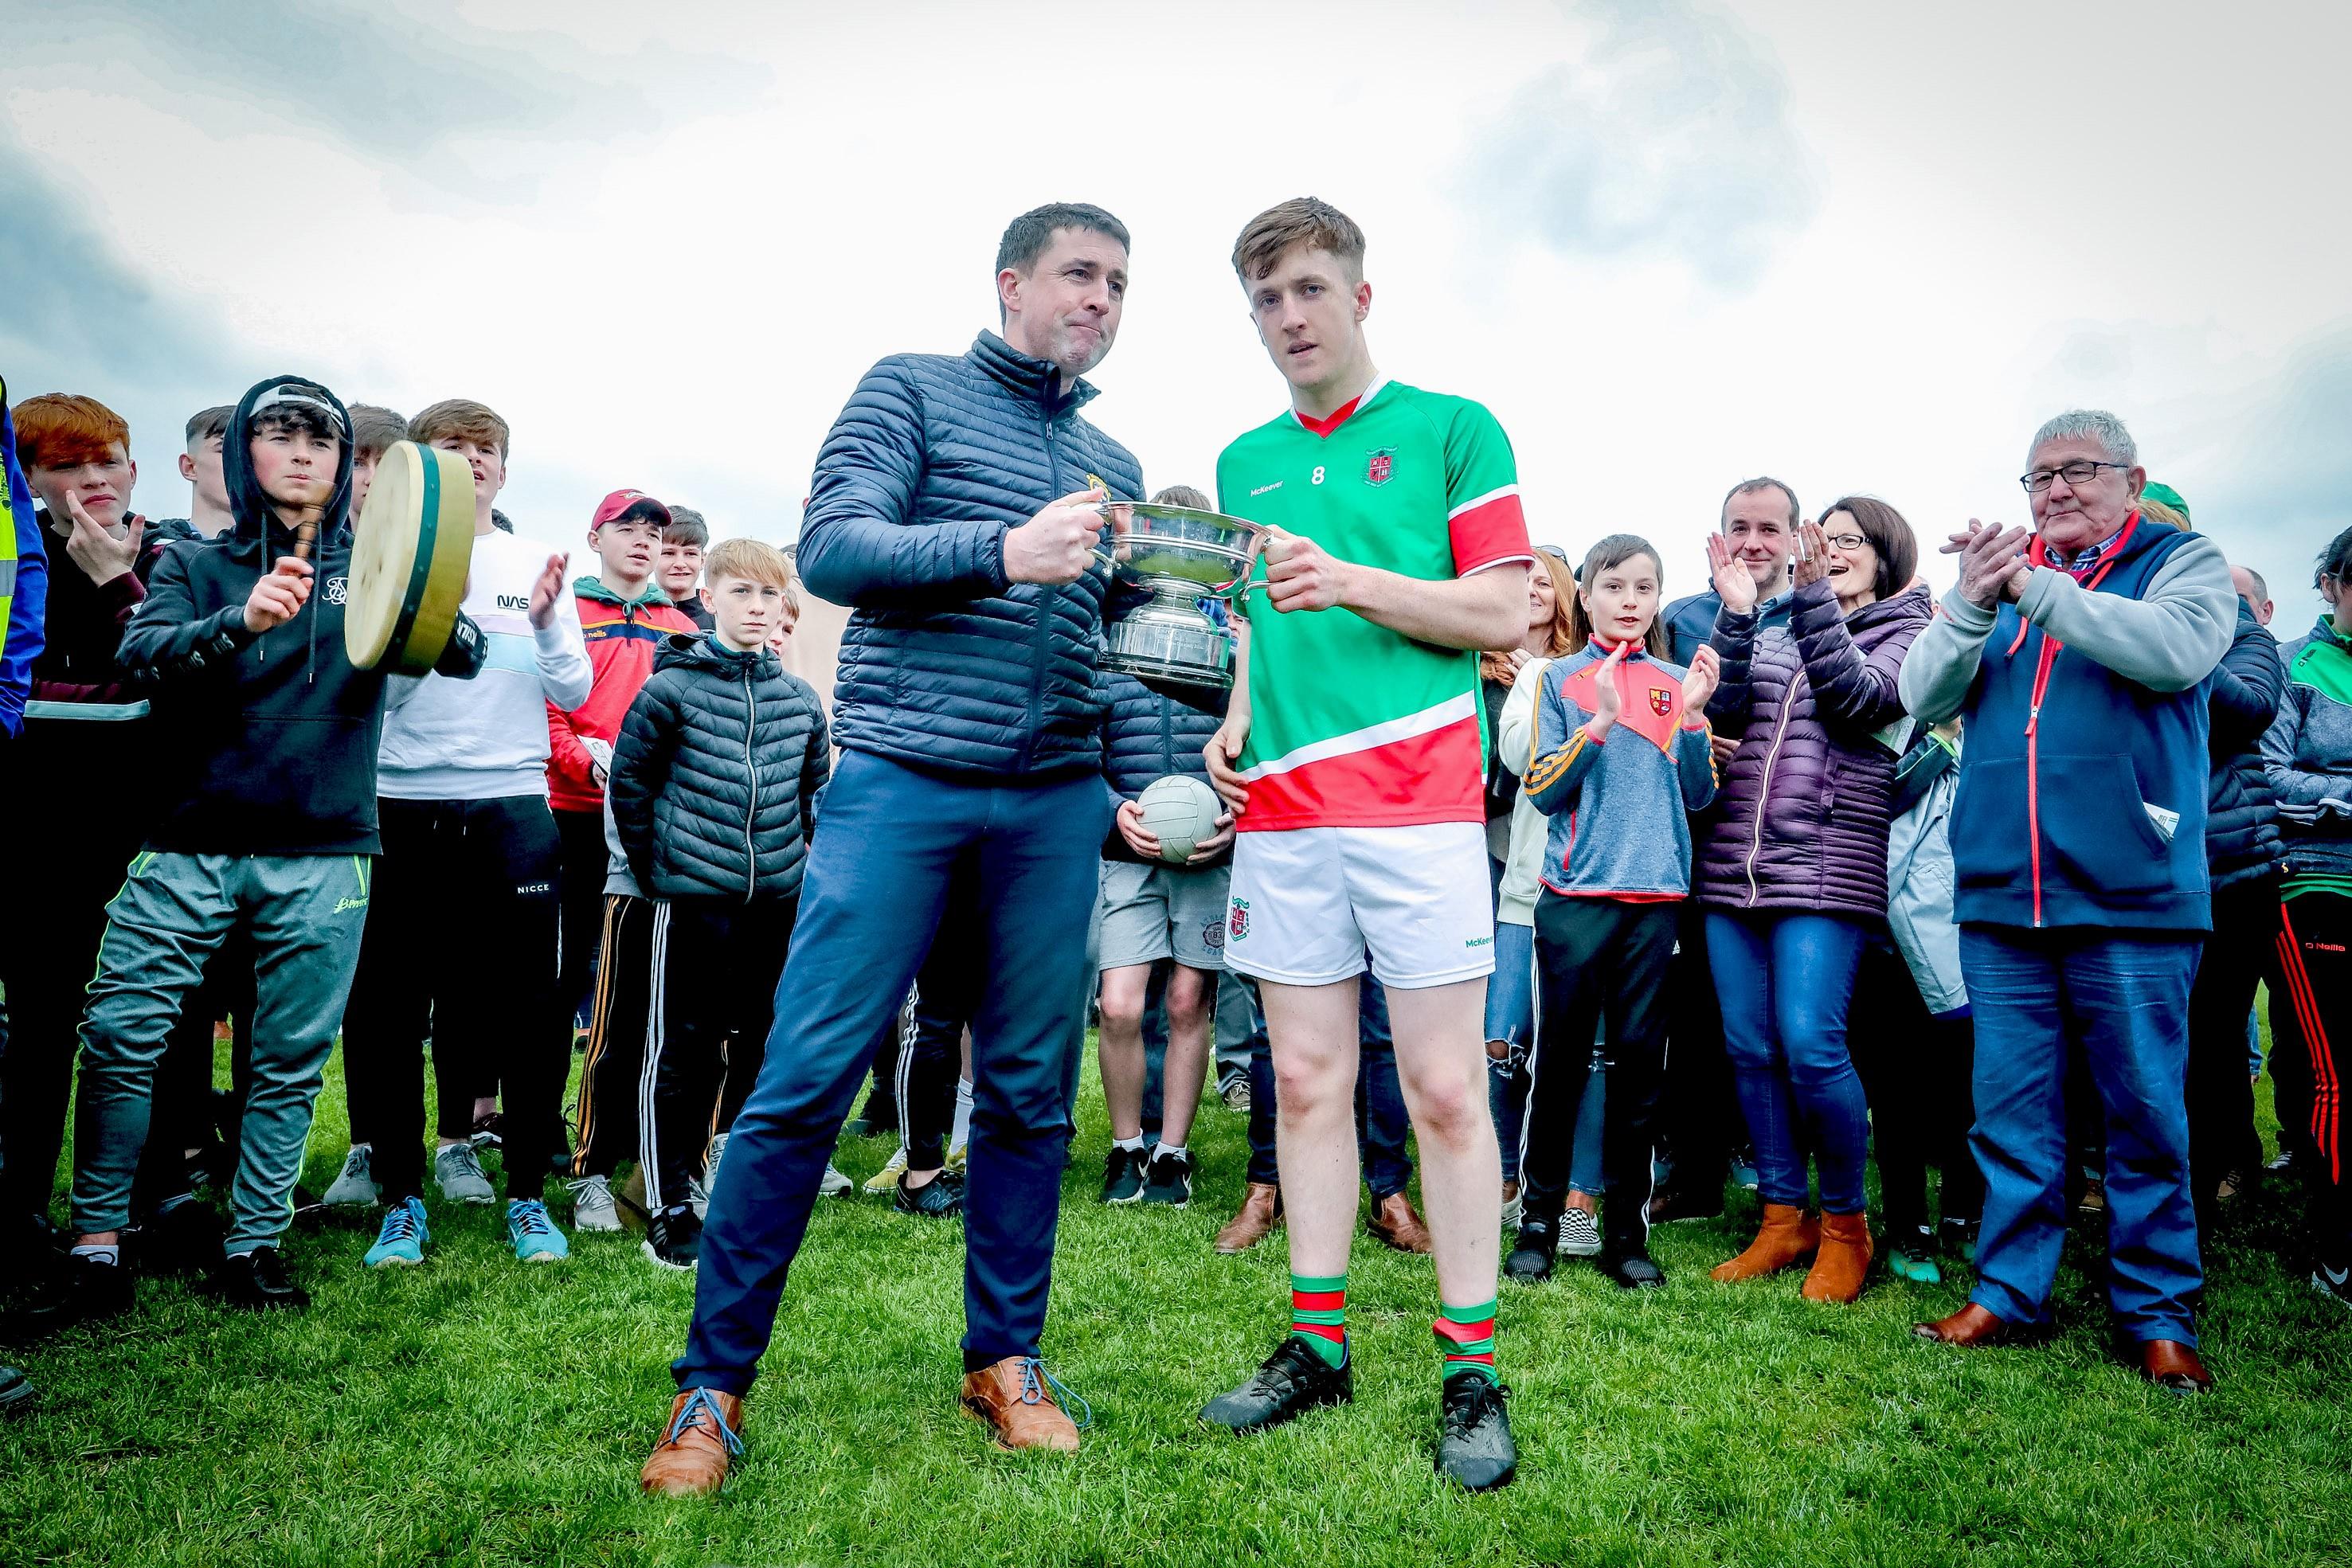 Dr. Eamon O'Sullivan Cup All-Ireland Senior C Football Final – Patrician Academy Mallow 2-14 St. Paul's Oughterard 3-8